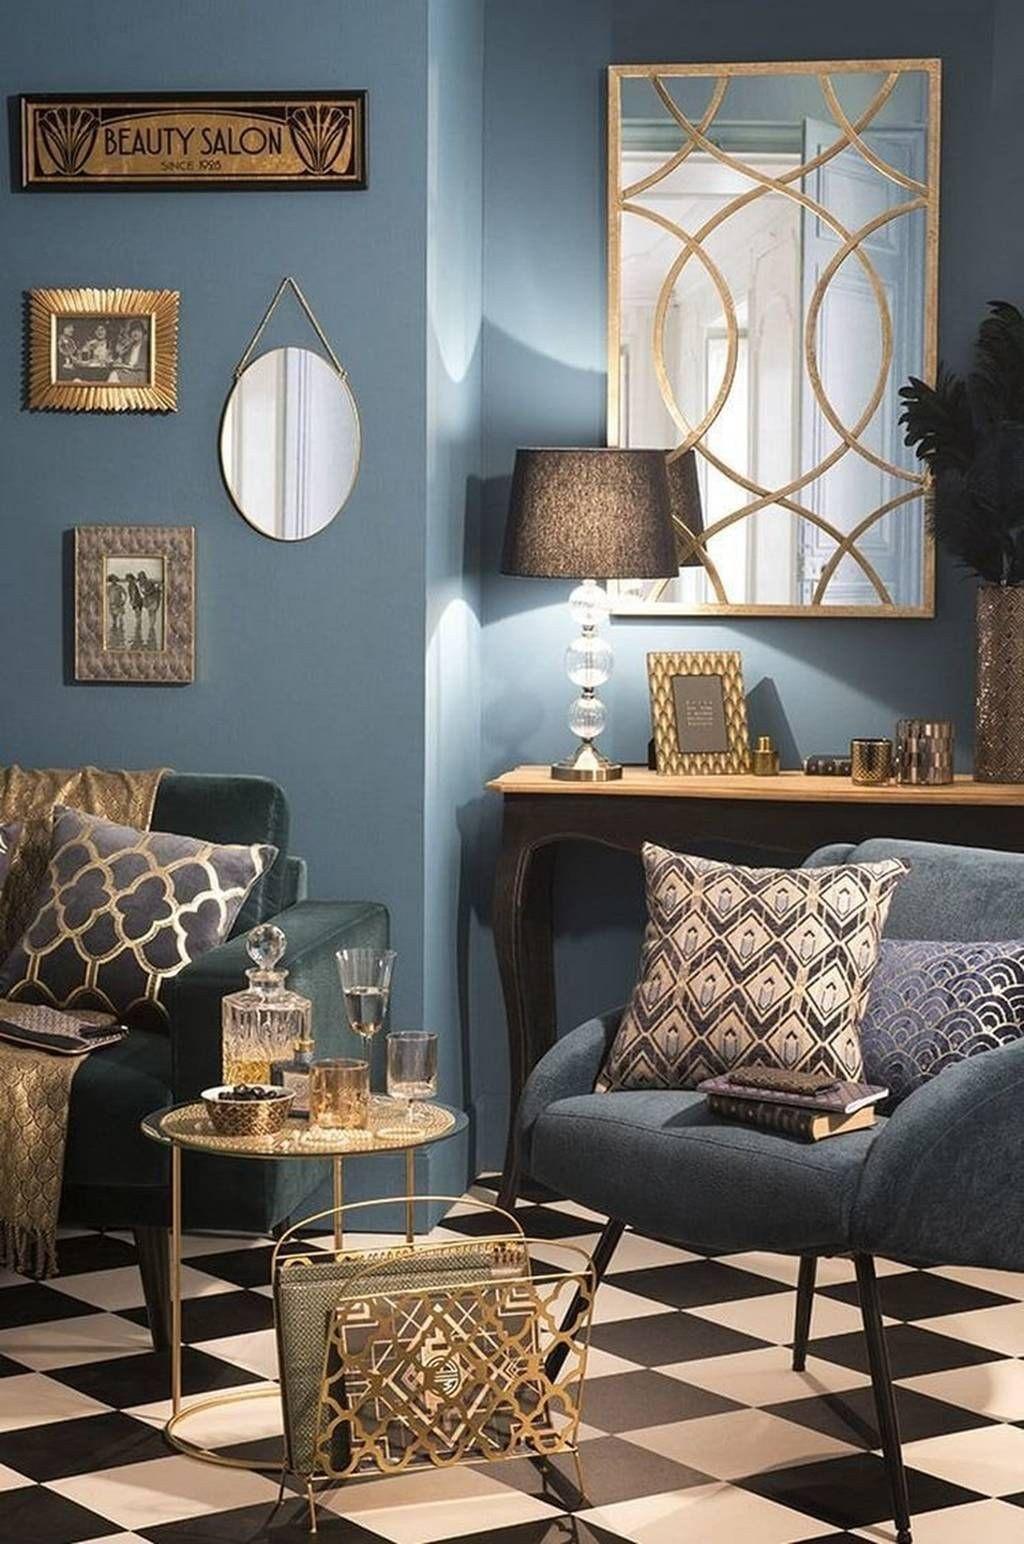 Modern Art Deco Living Room Moodboard Collection Art Deco Living Room Art Deco Interior Design Interior Deco